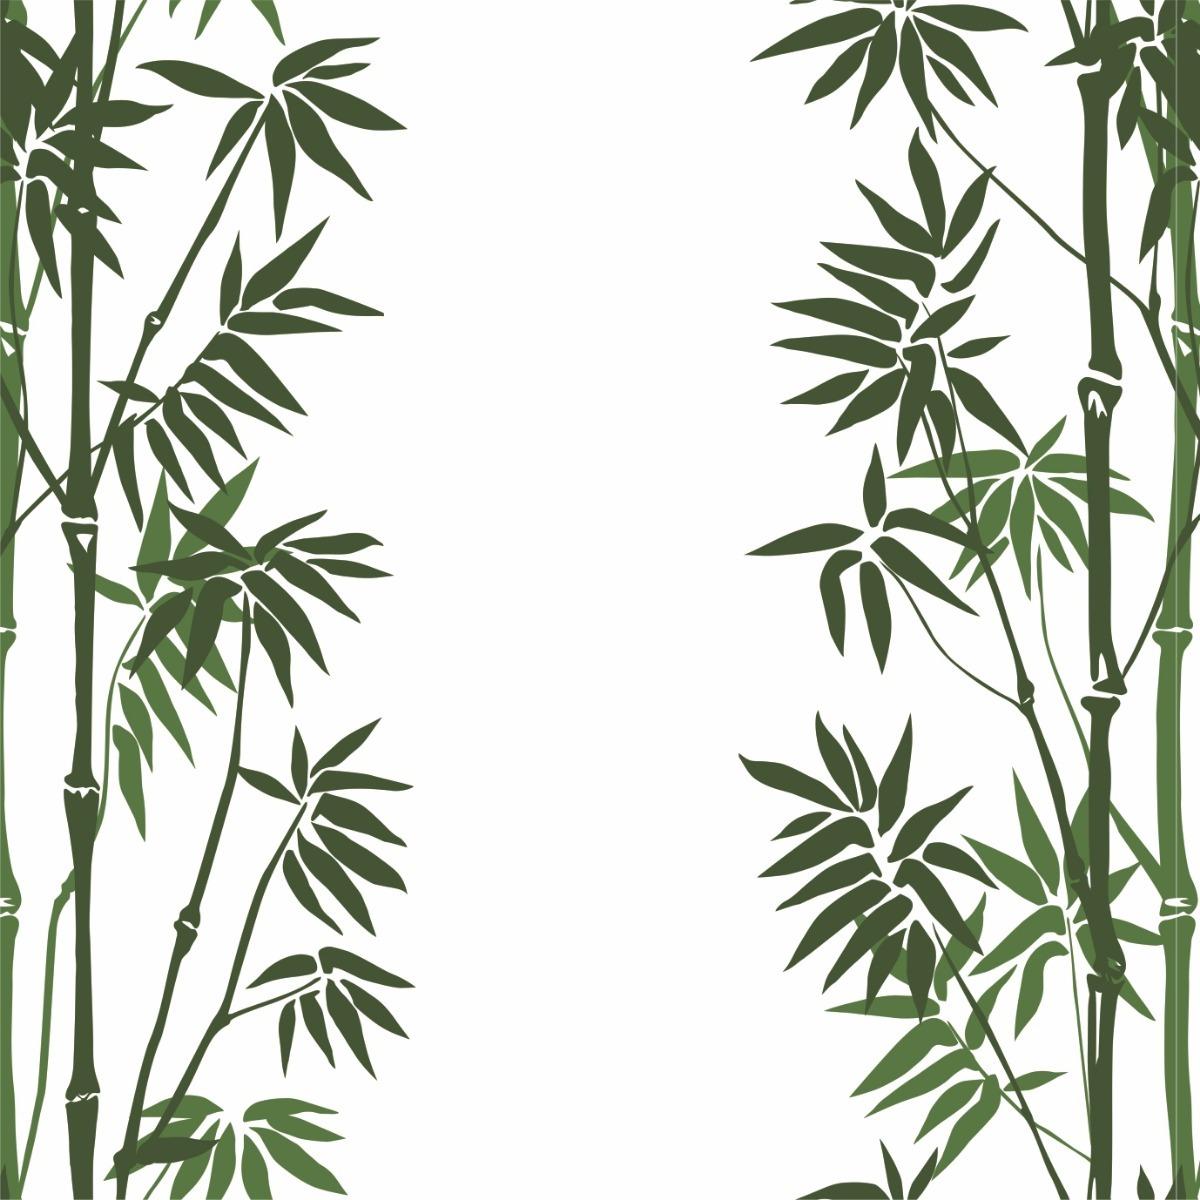 Papel De Parede Contact Sala Folhas Bamboo Bambu 3 Mts R 39 90 Em  -> Papel De Parede Para Sala Folhas